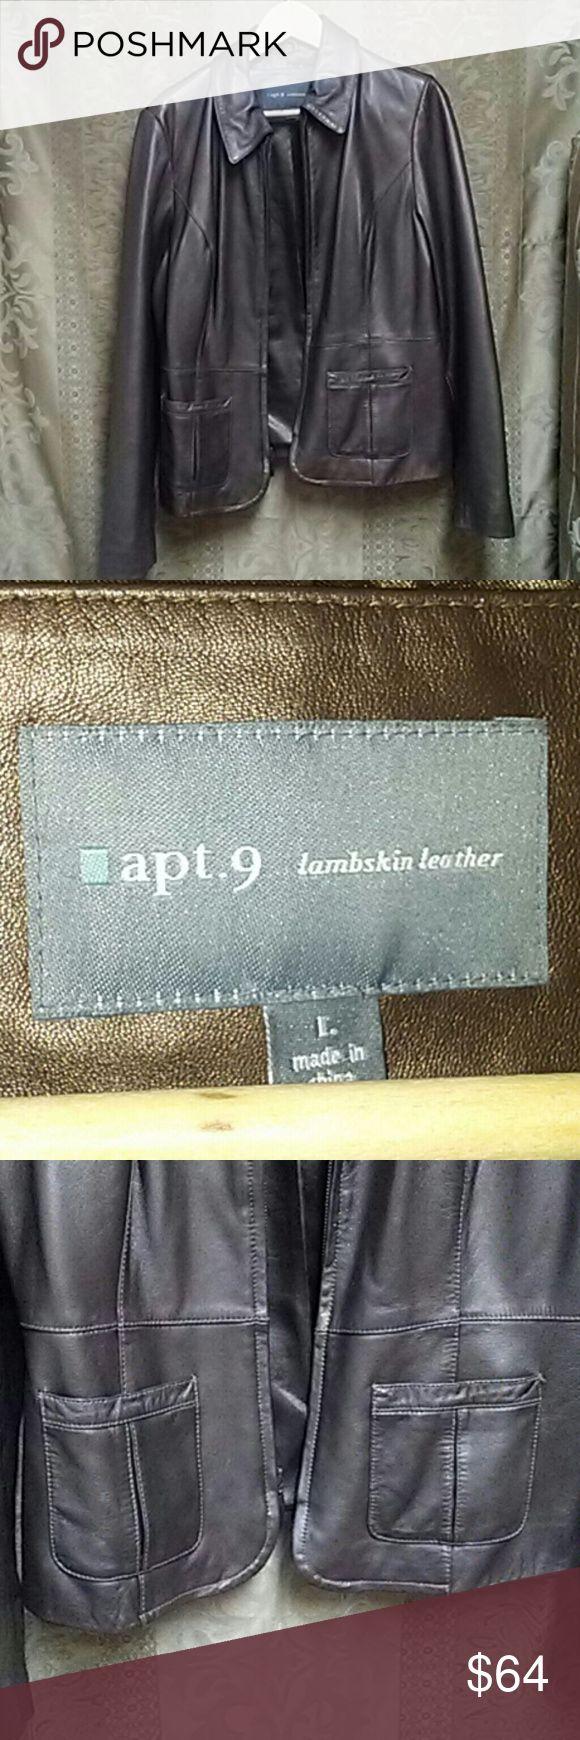 Lambskin leather jacket Luxurious lambskin,  copper colored, zipper closure, leather jacket, Size Large Apt. 9 Jackets & Coats Blazers